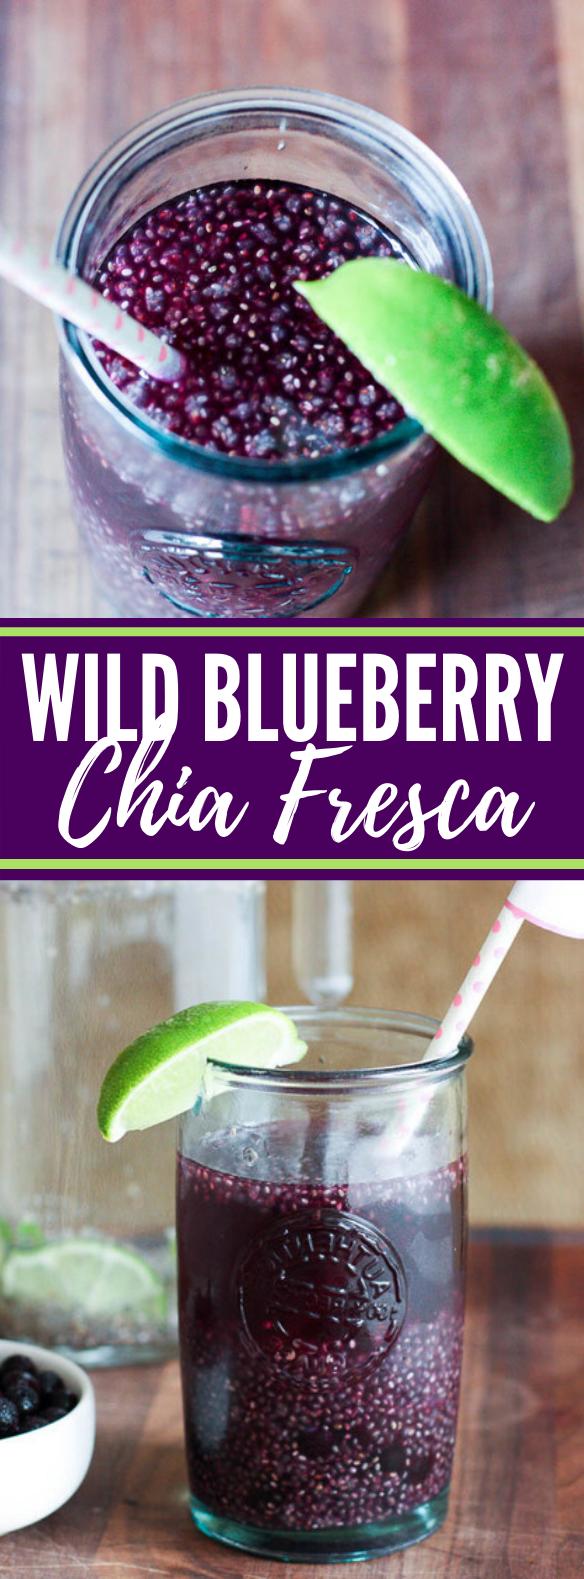 Wild Blueberry Chia Fresca #drinks #healthy